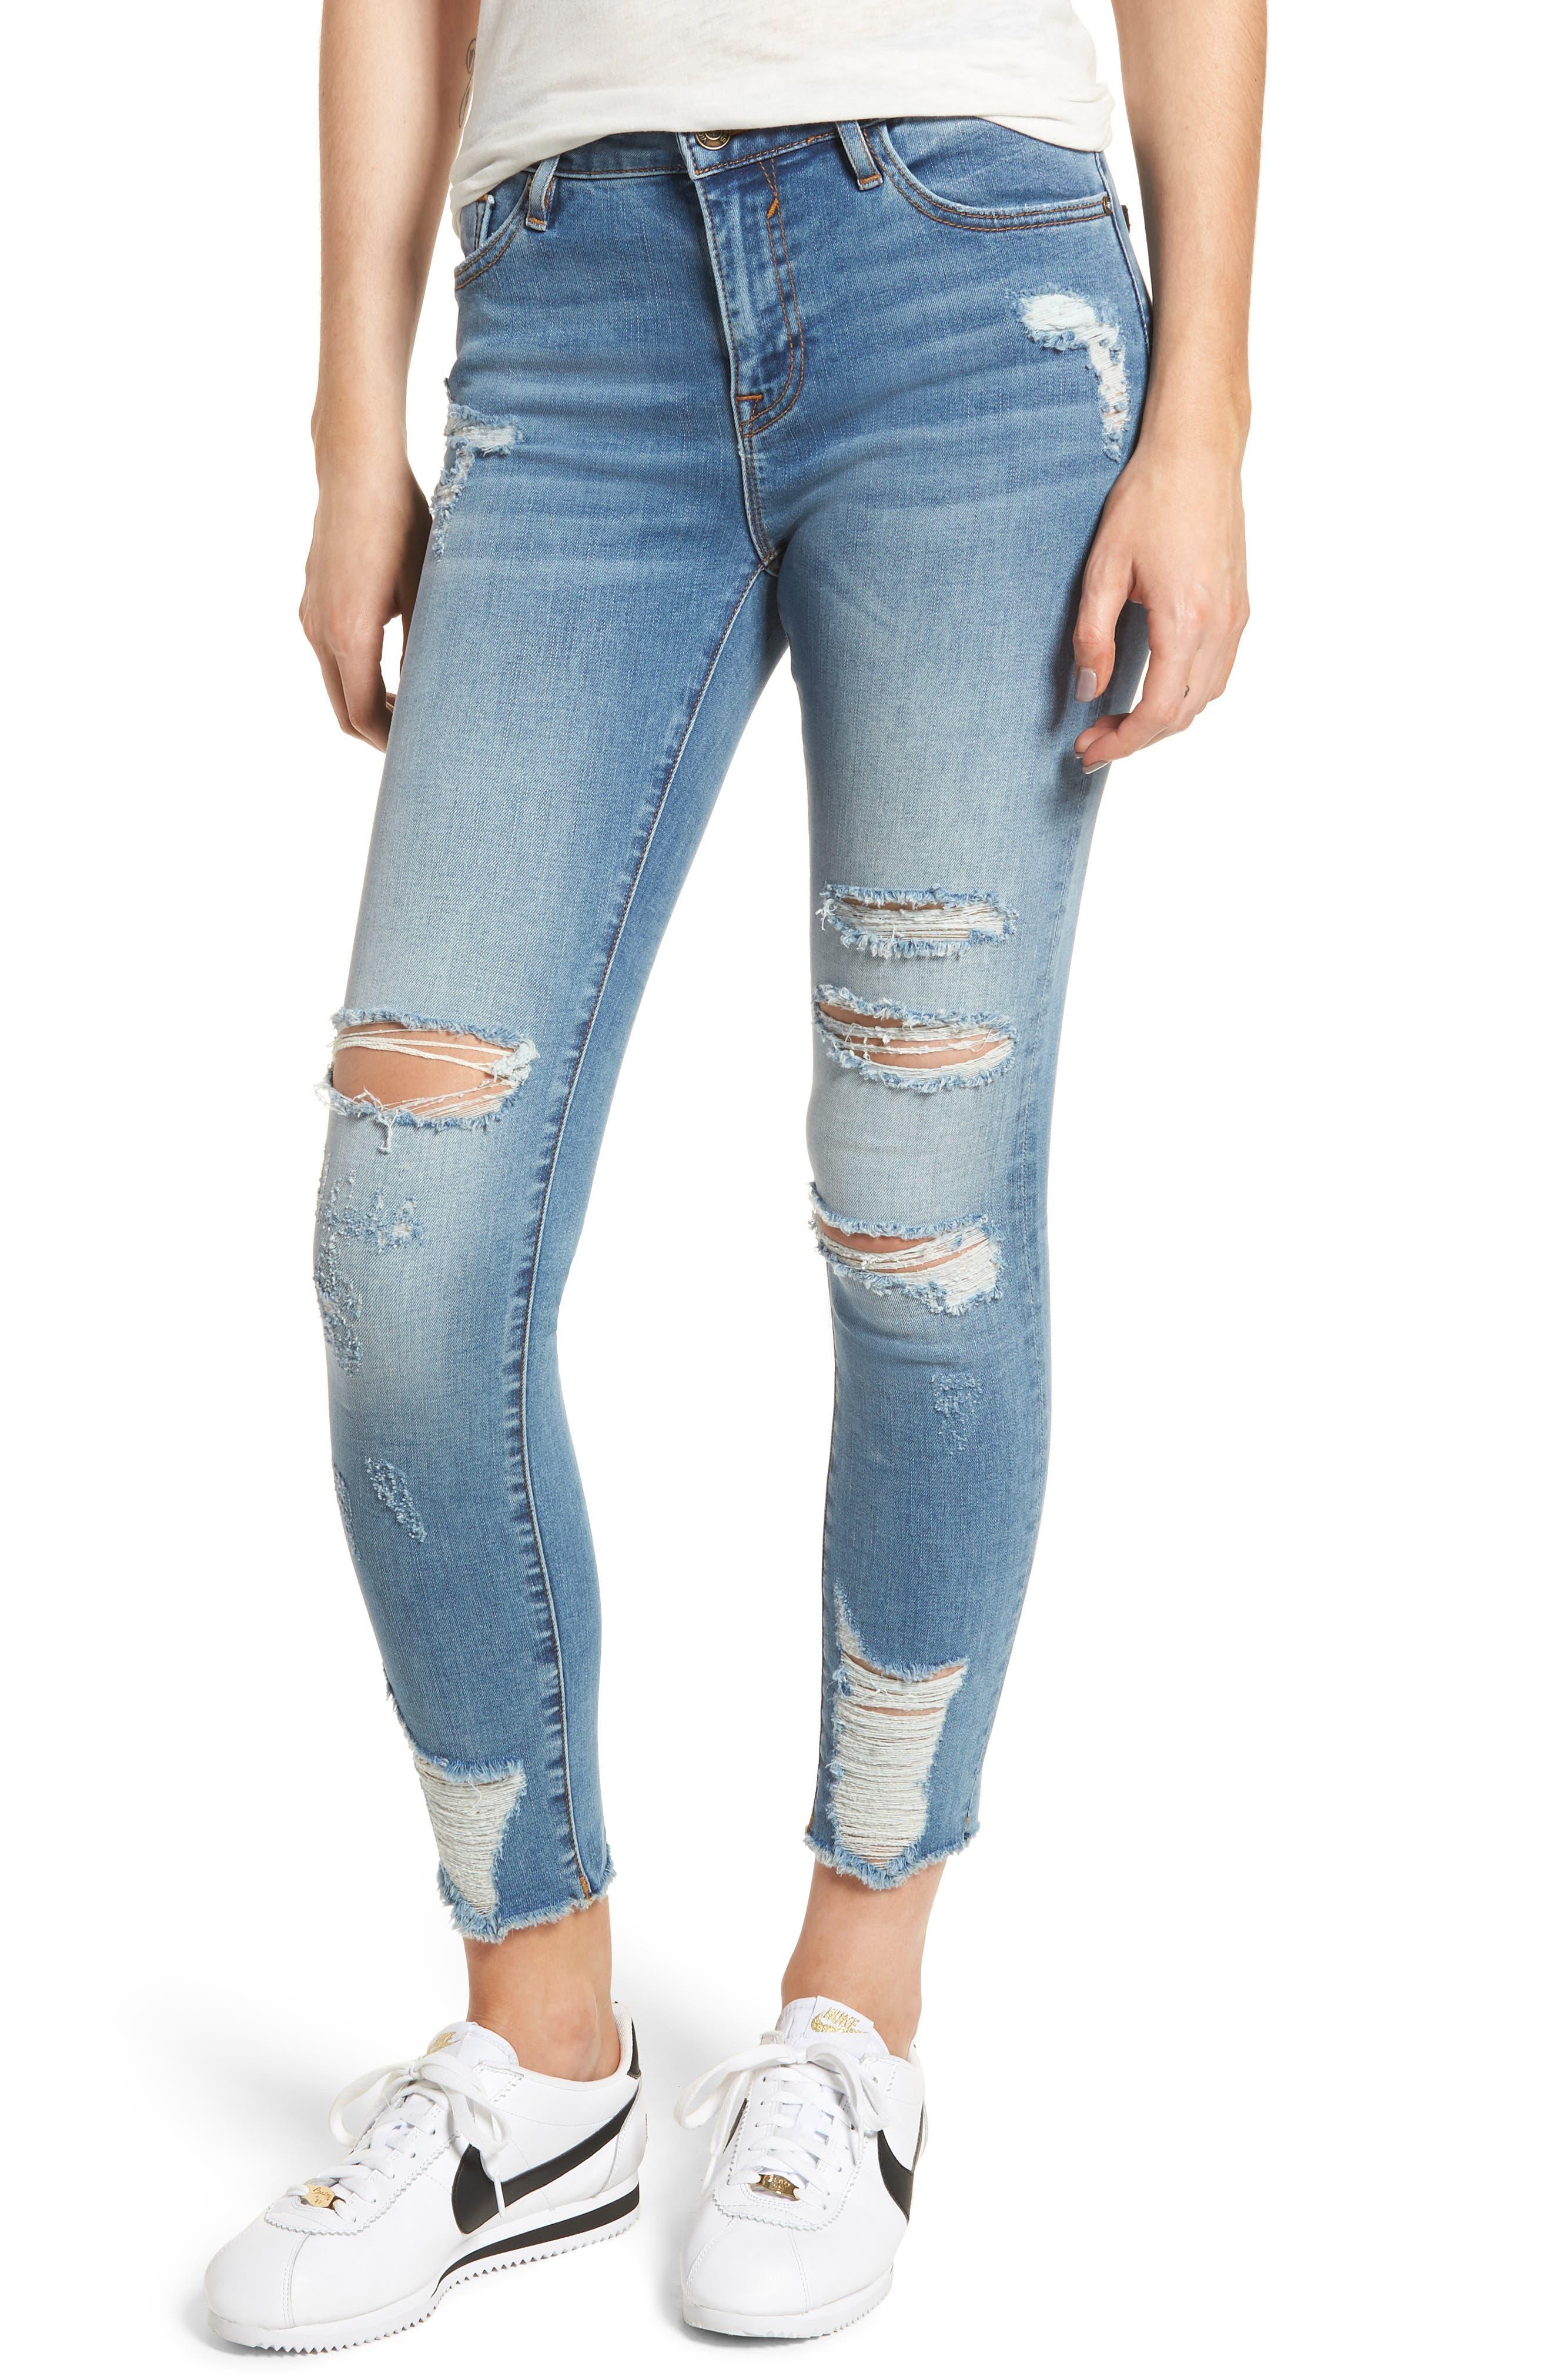 Vigoss Marley Distressed Skinny Jeans